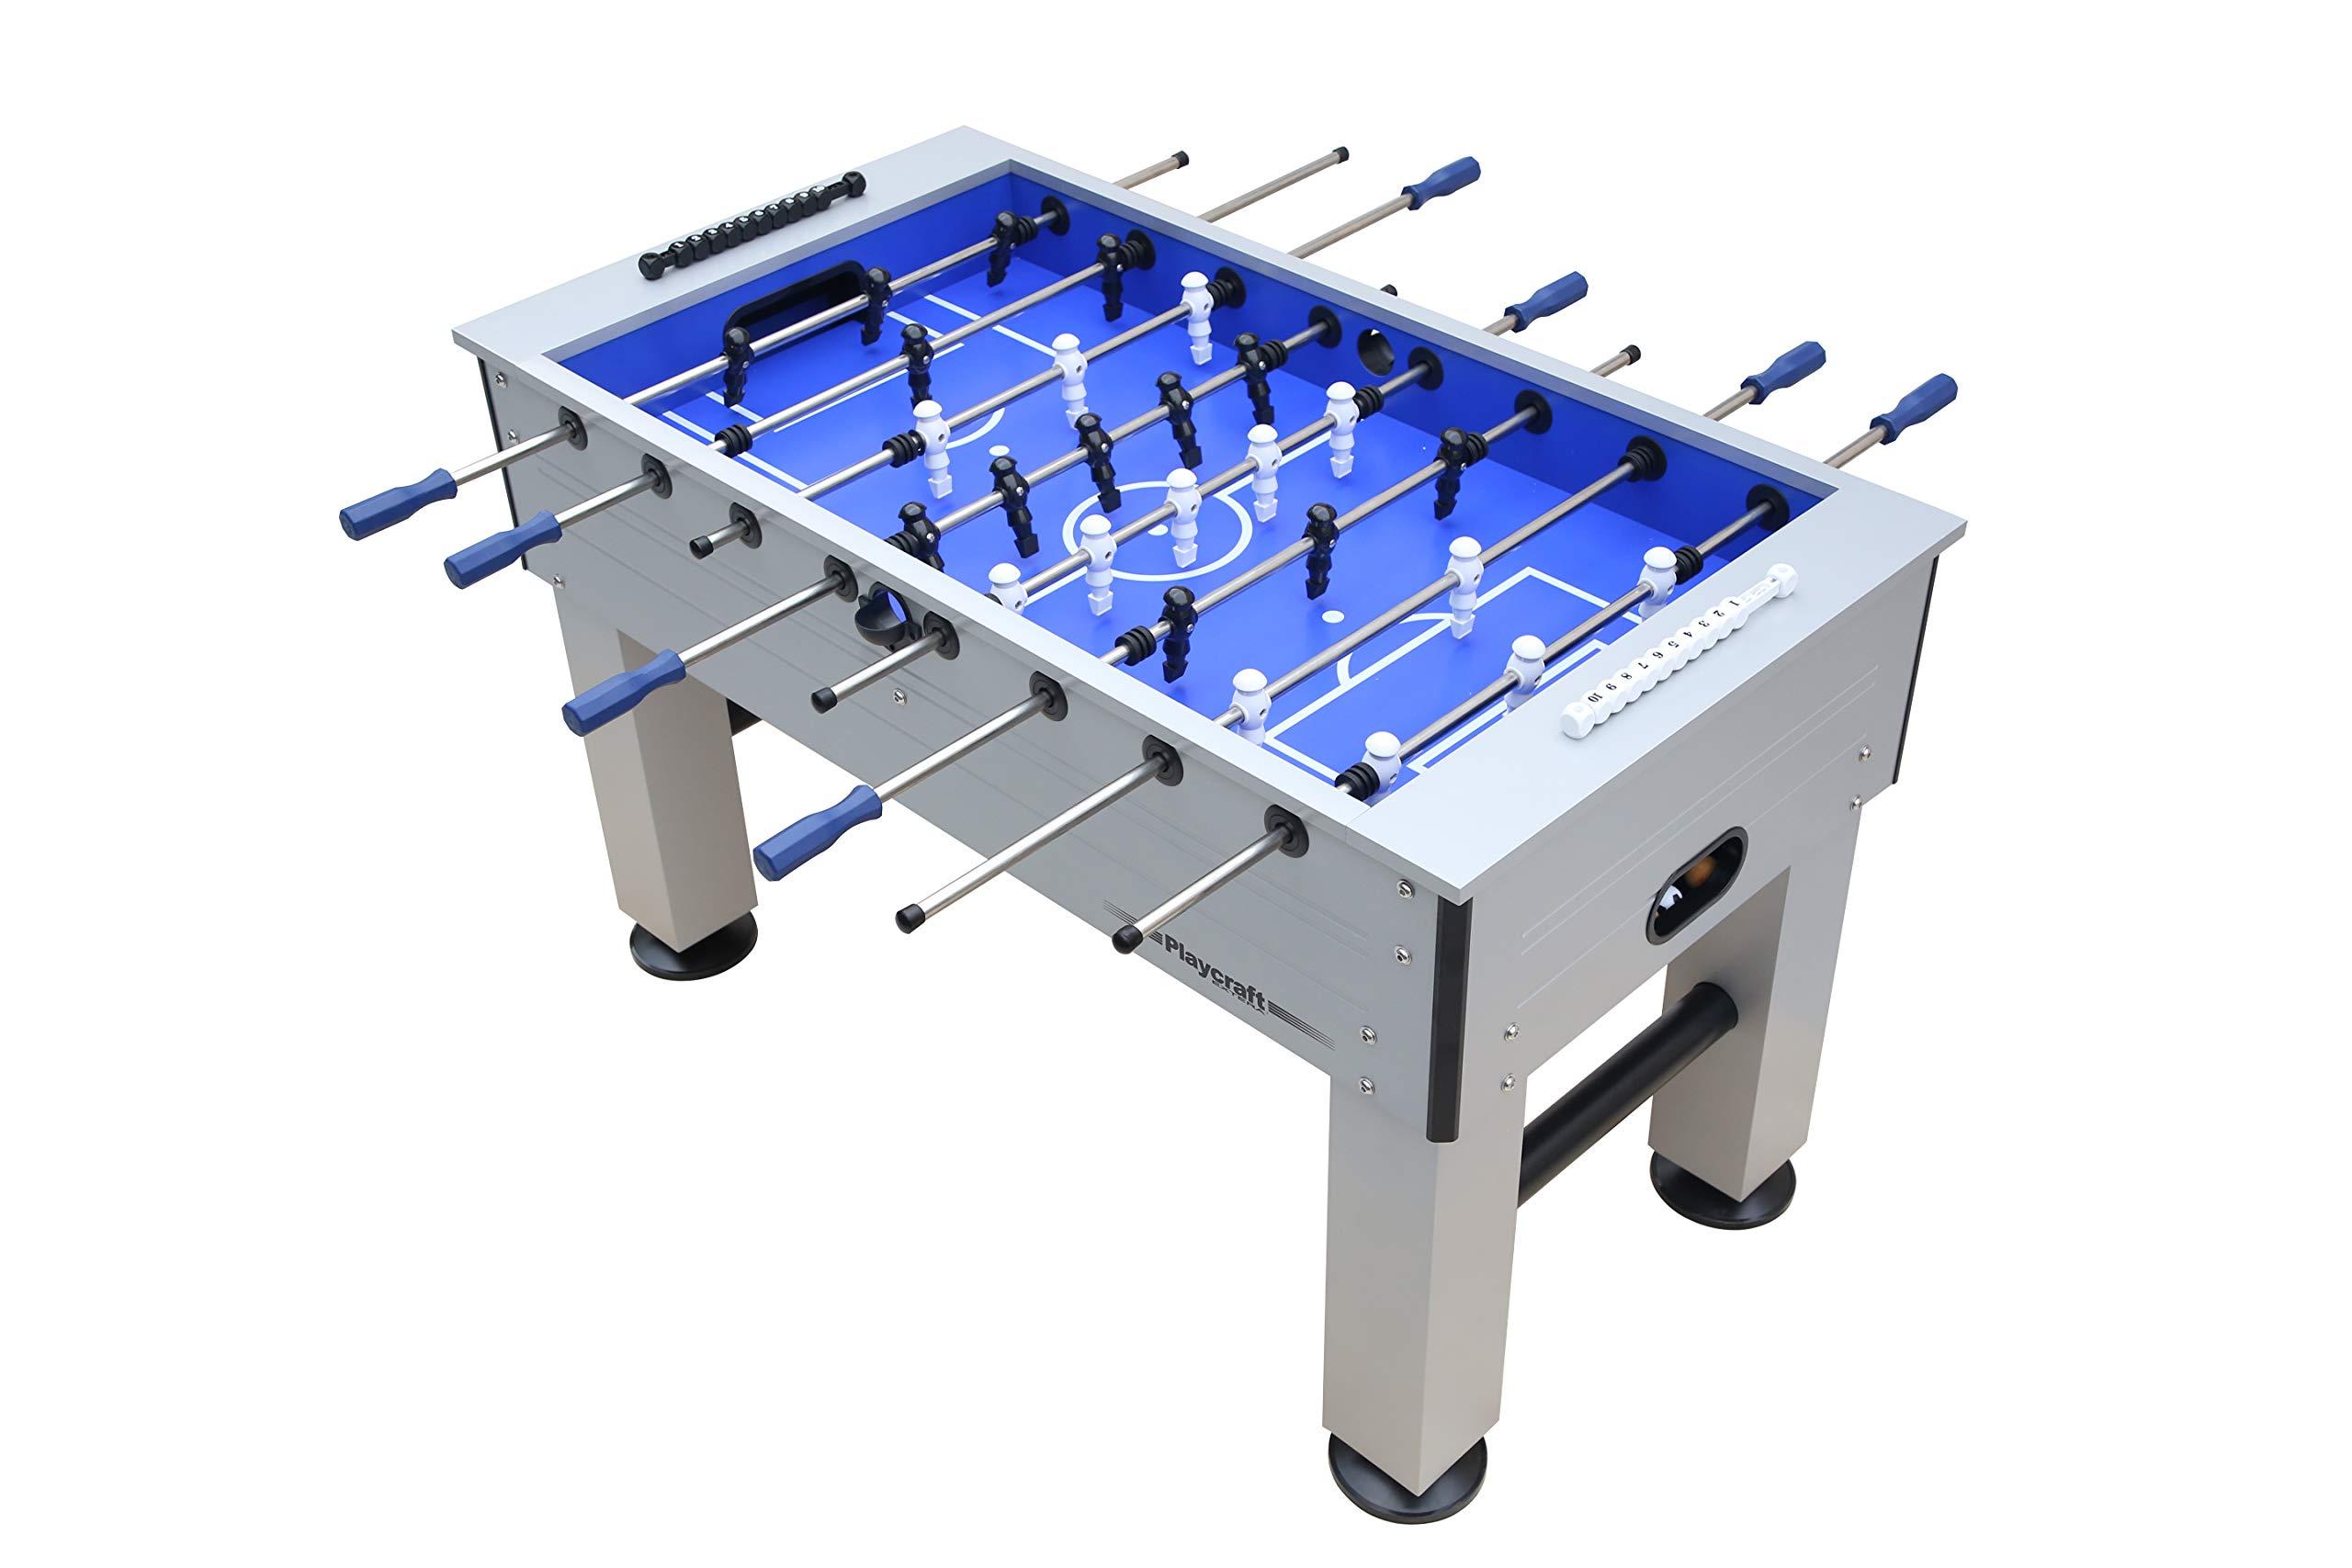 4. Playcraft Extera Outdoor Foosball Table